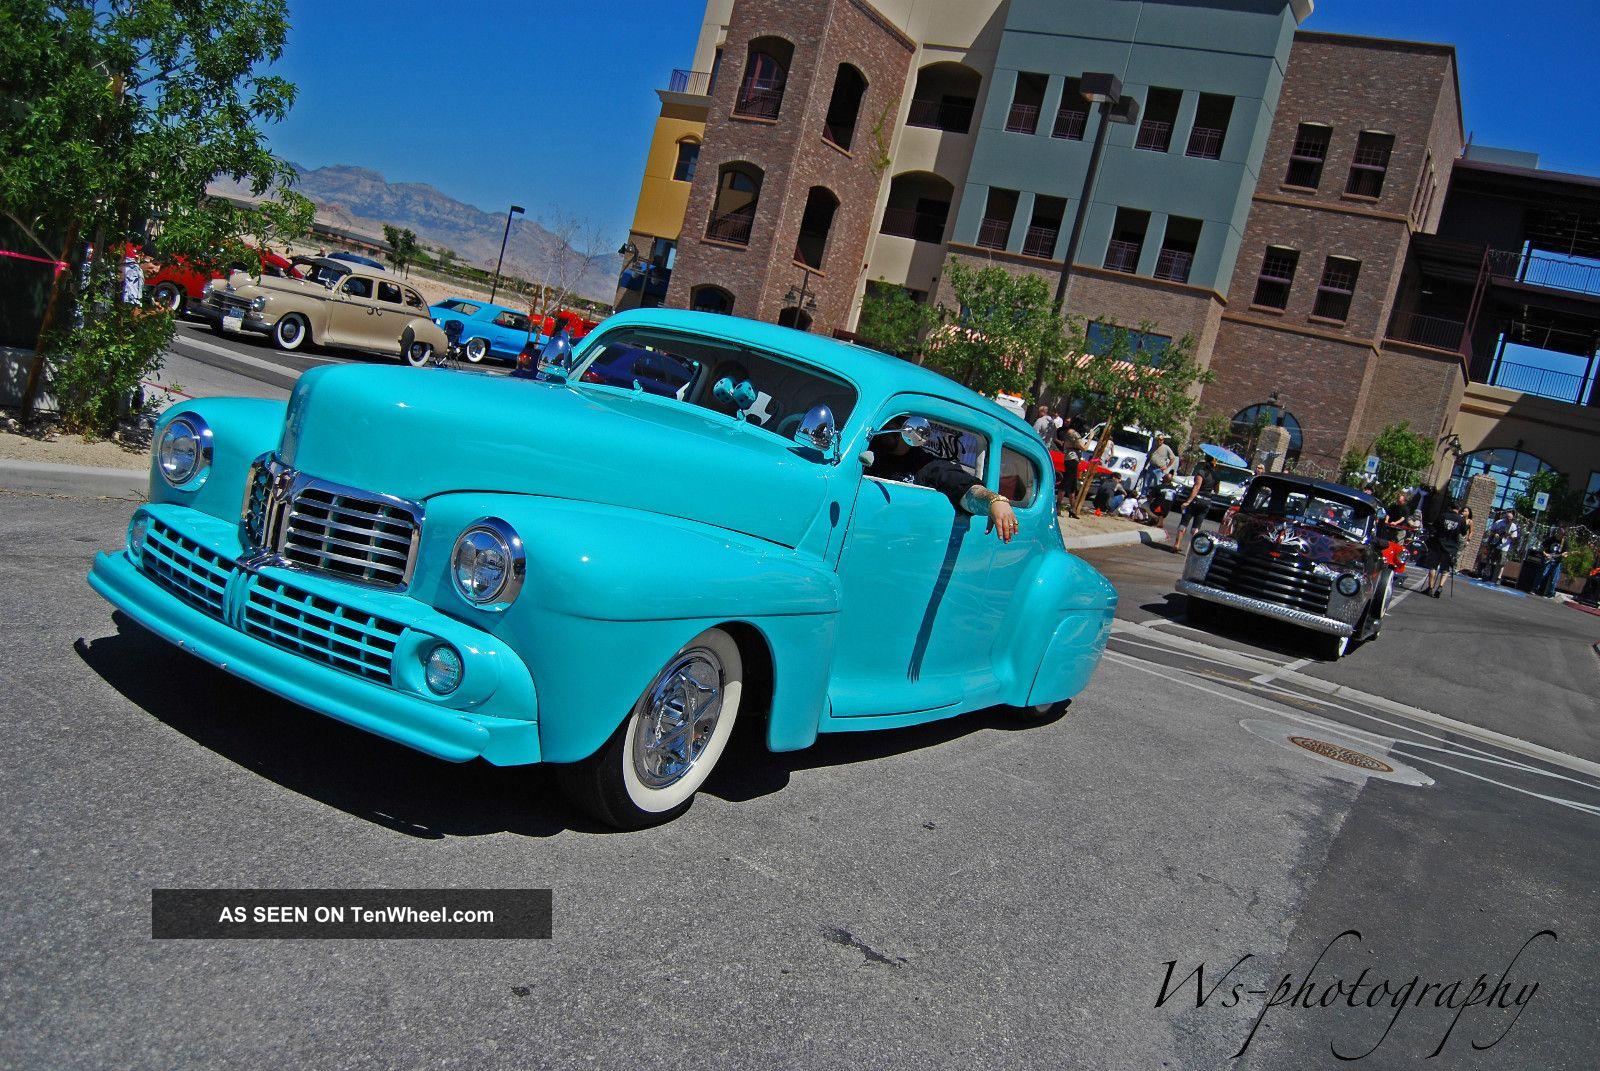 1947 Lincoln Continental 2 Door Chopped Dropped Cruiser Kustom Custom Continental photo